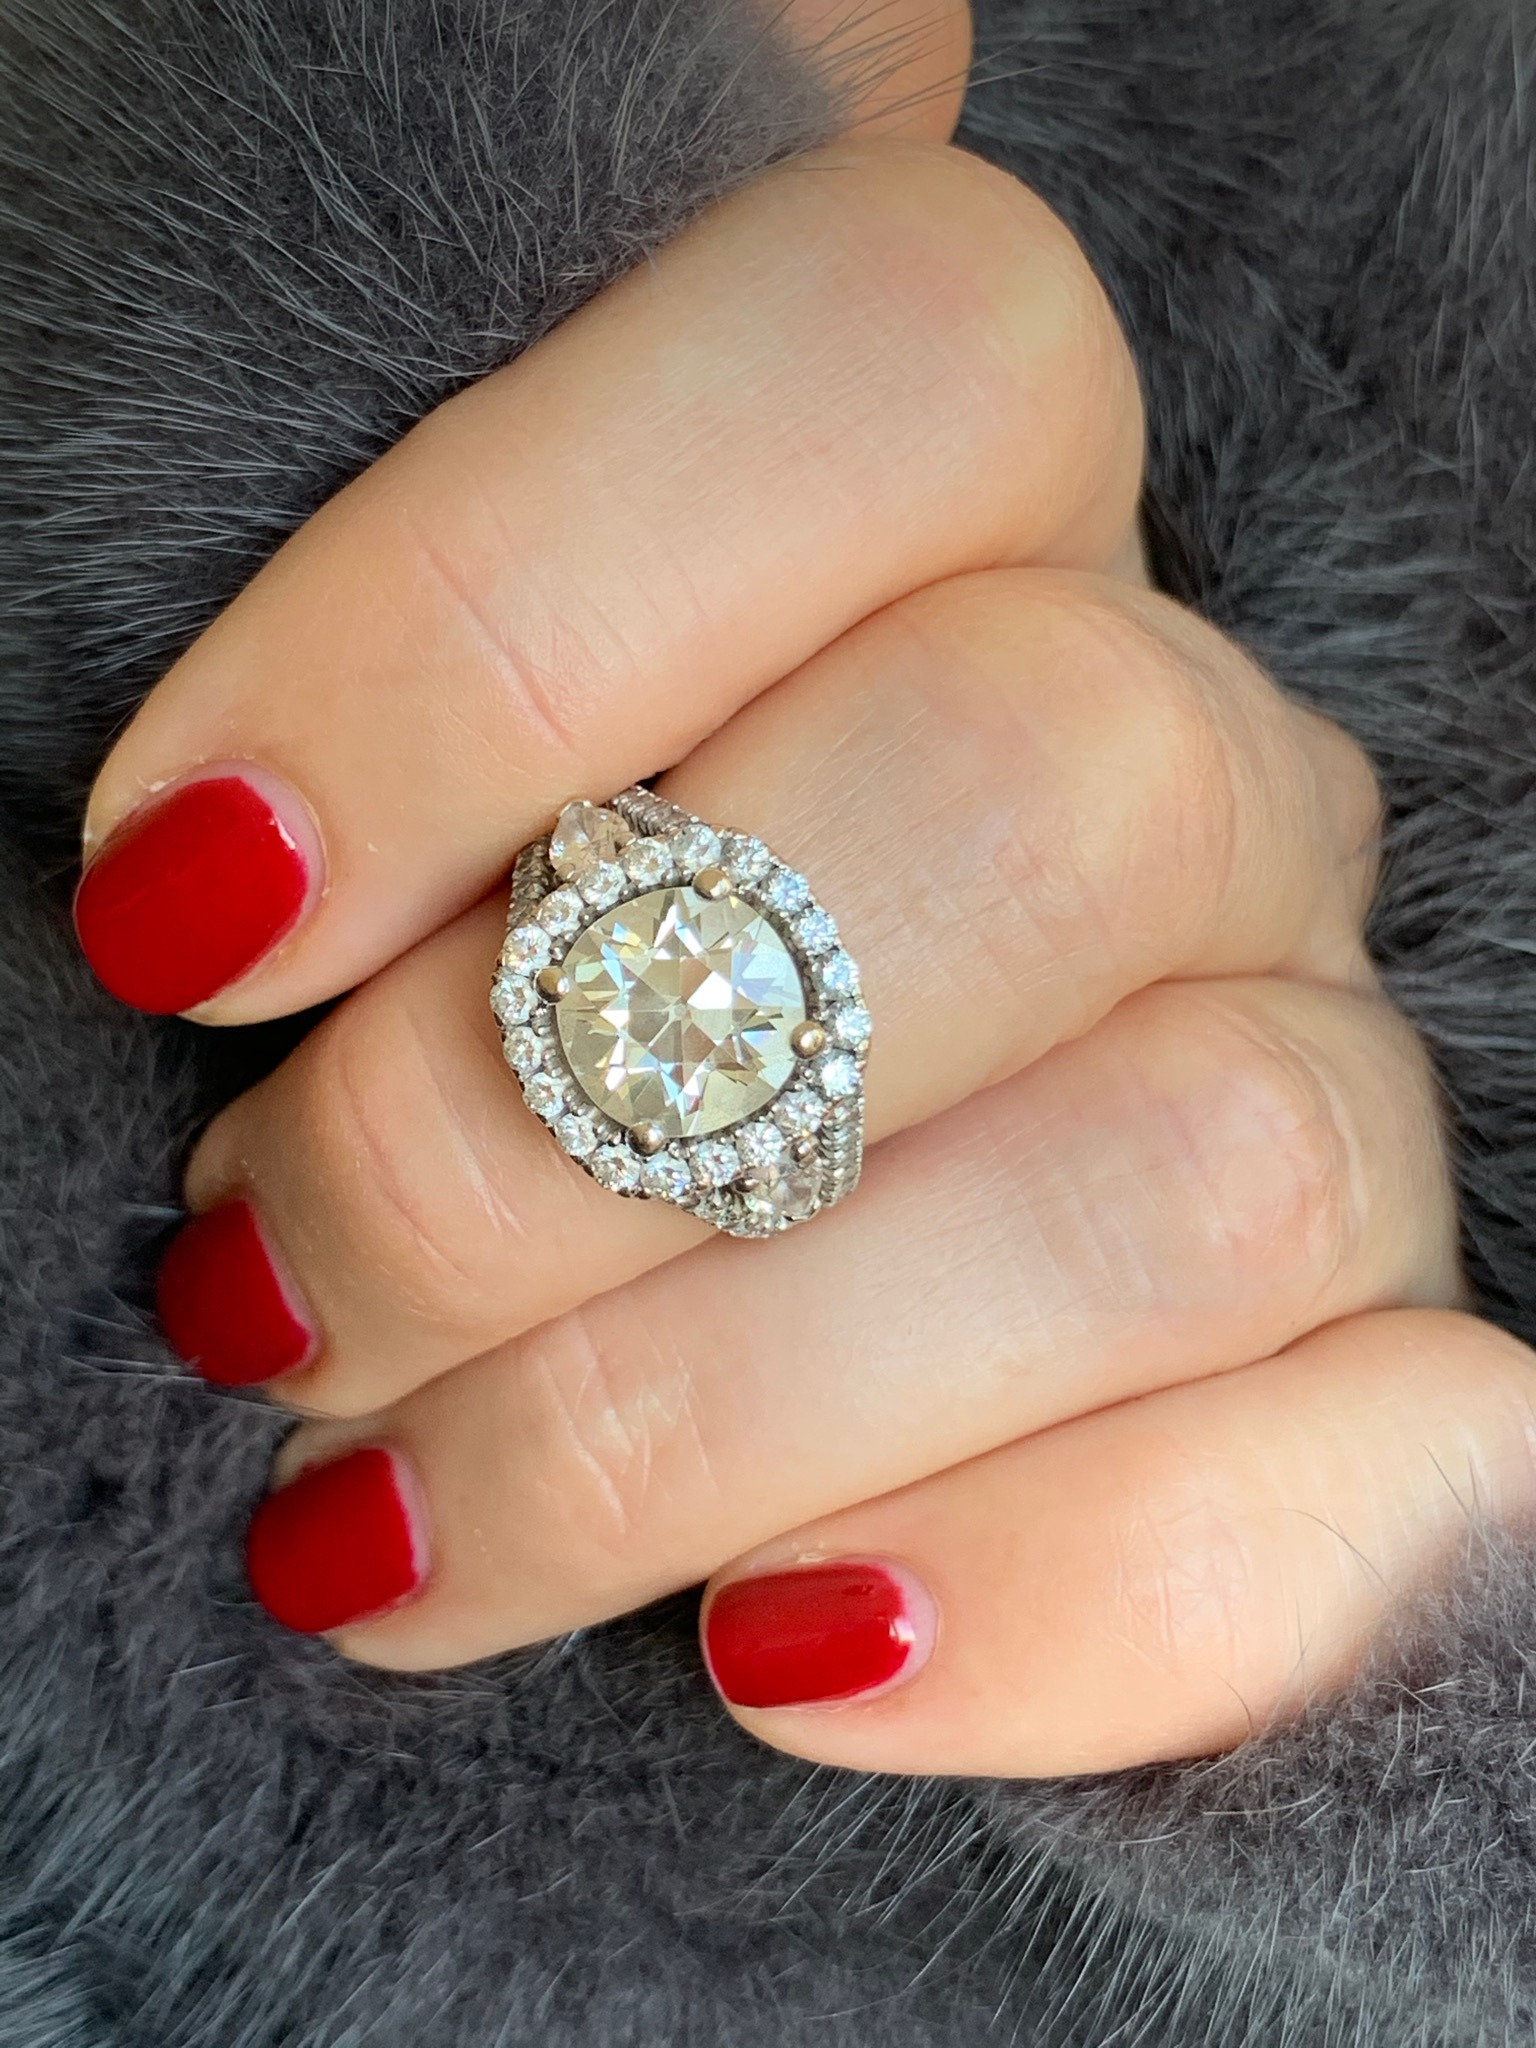 3.3 carat old cut diamond ring